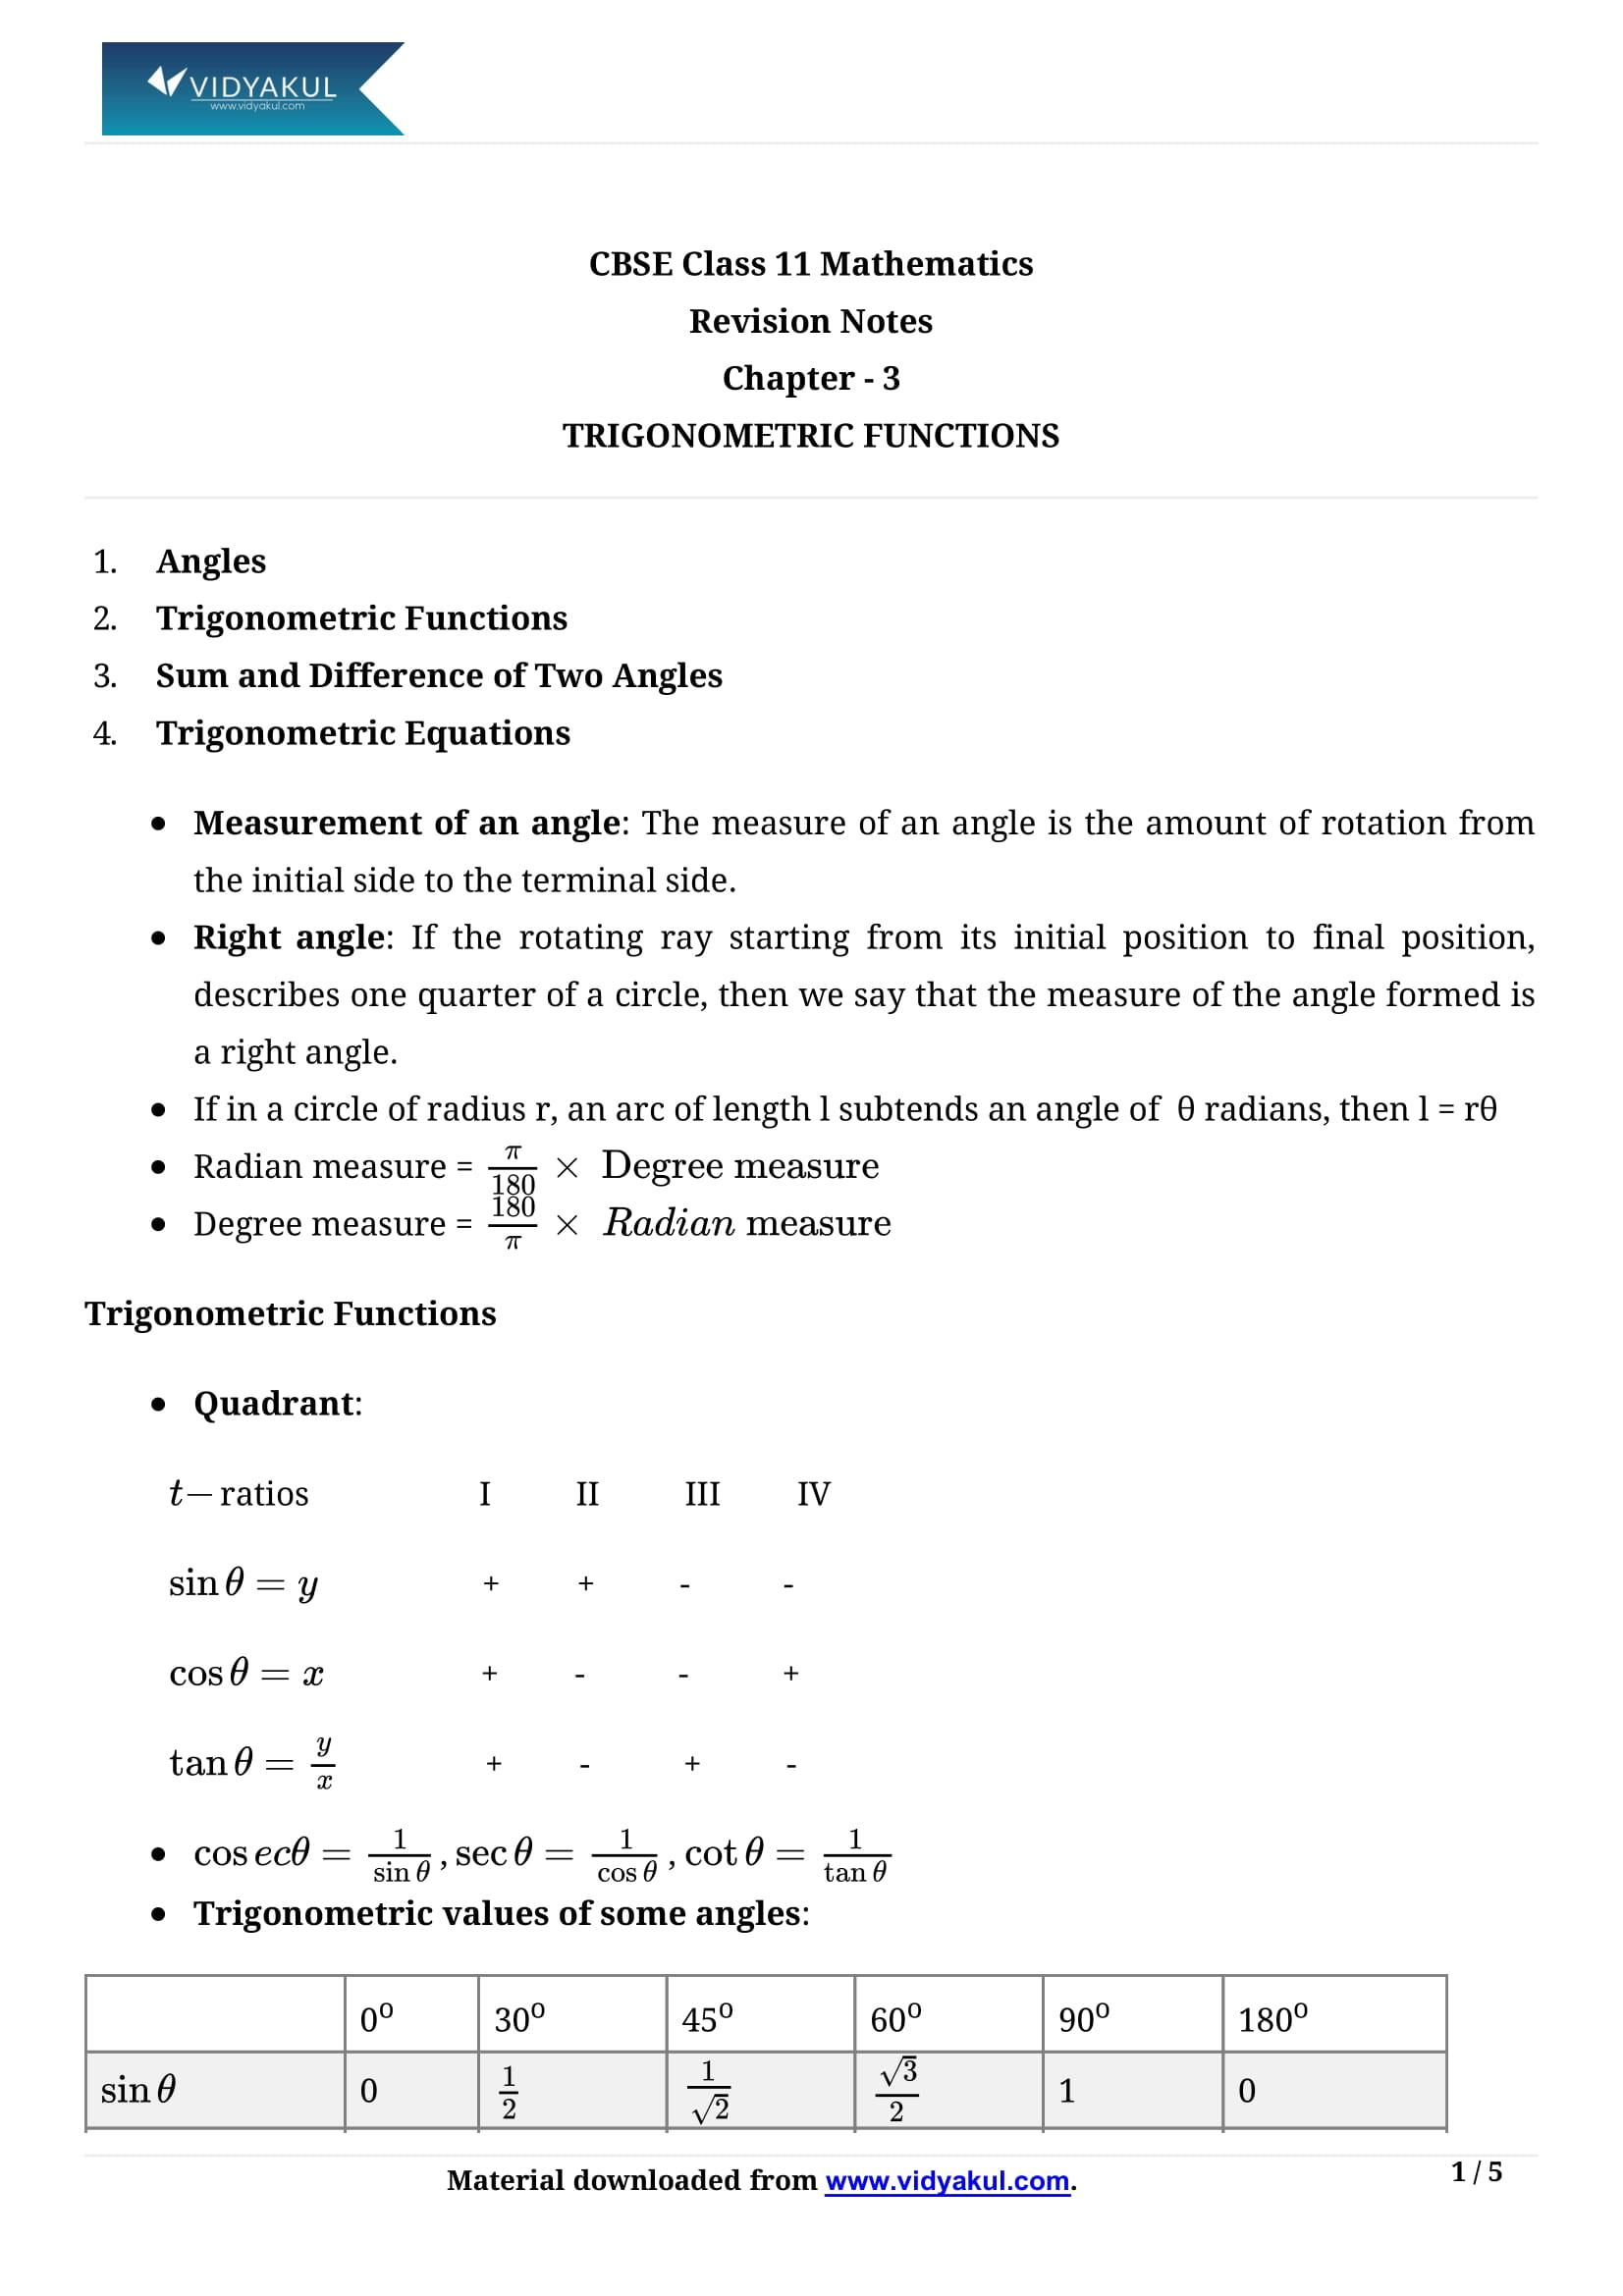 Trigonometric Functions Class 11 Formulas & Notes | Vidyakul